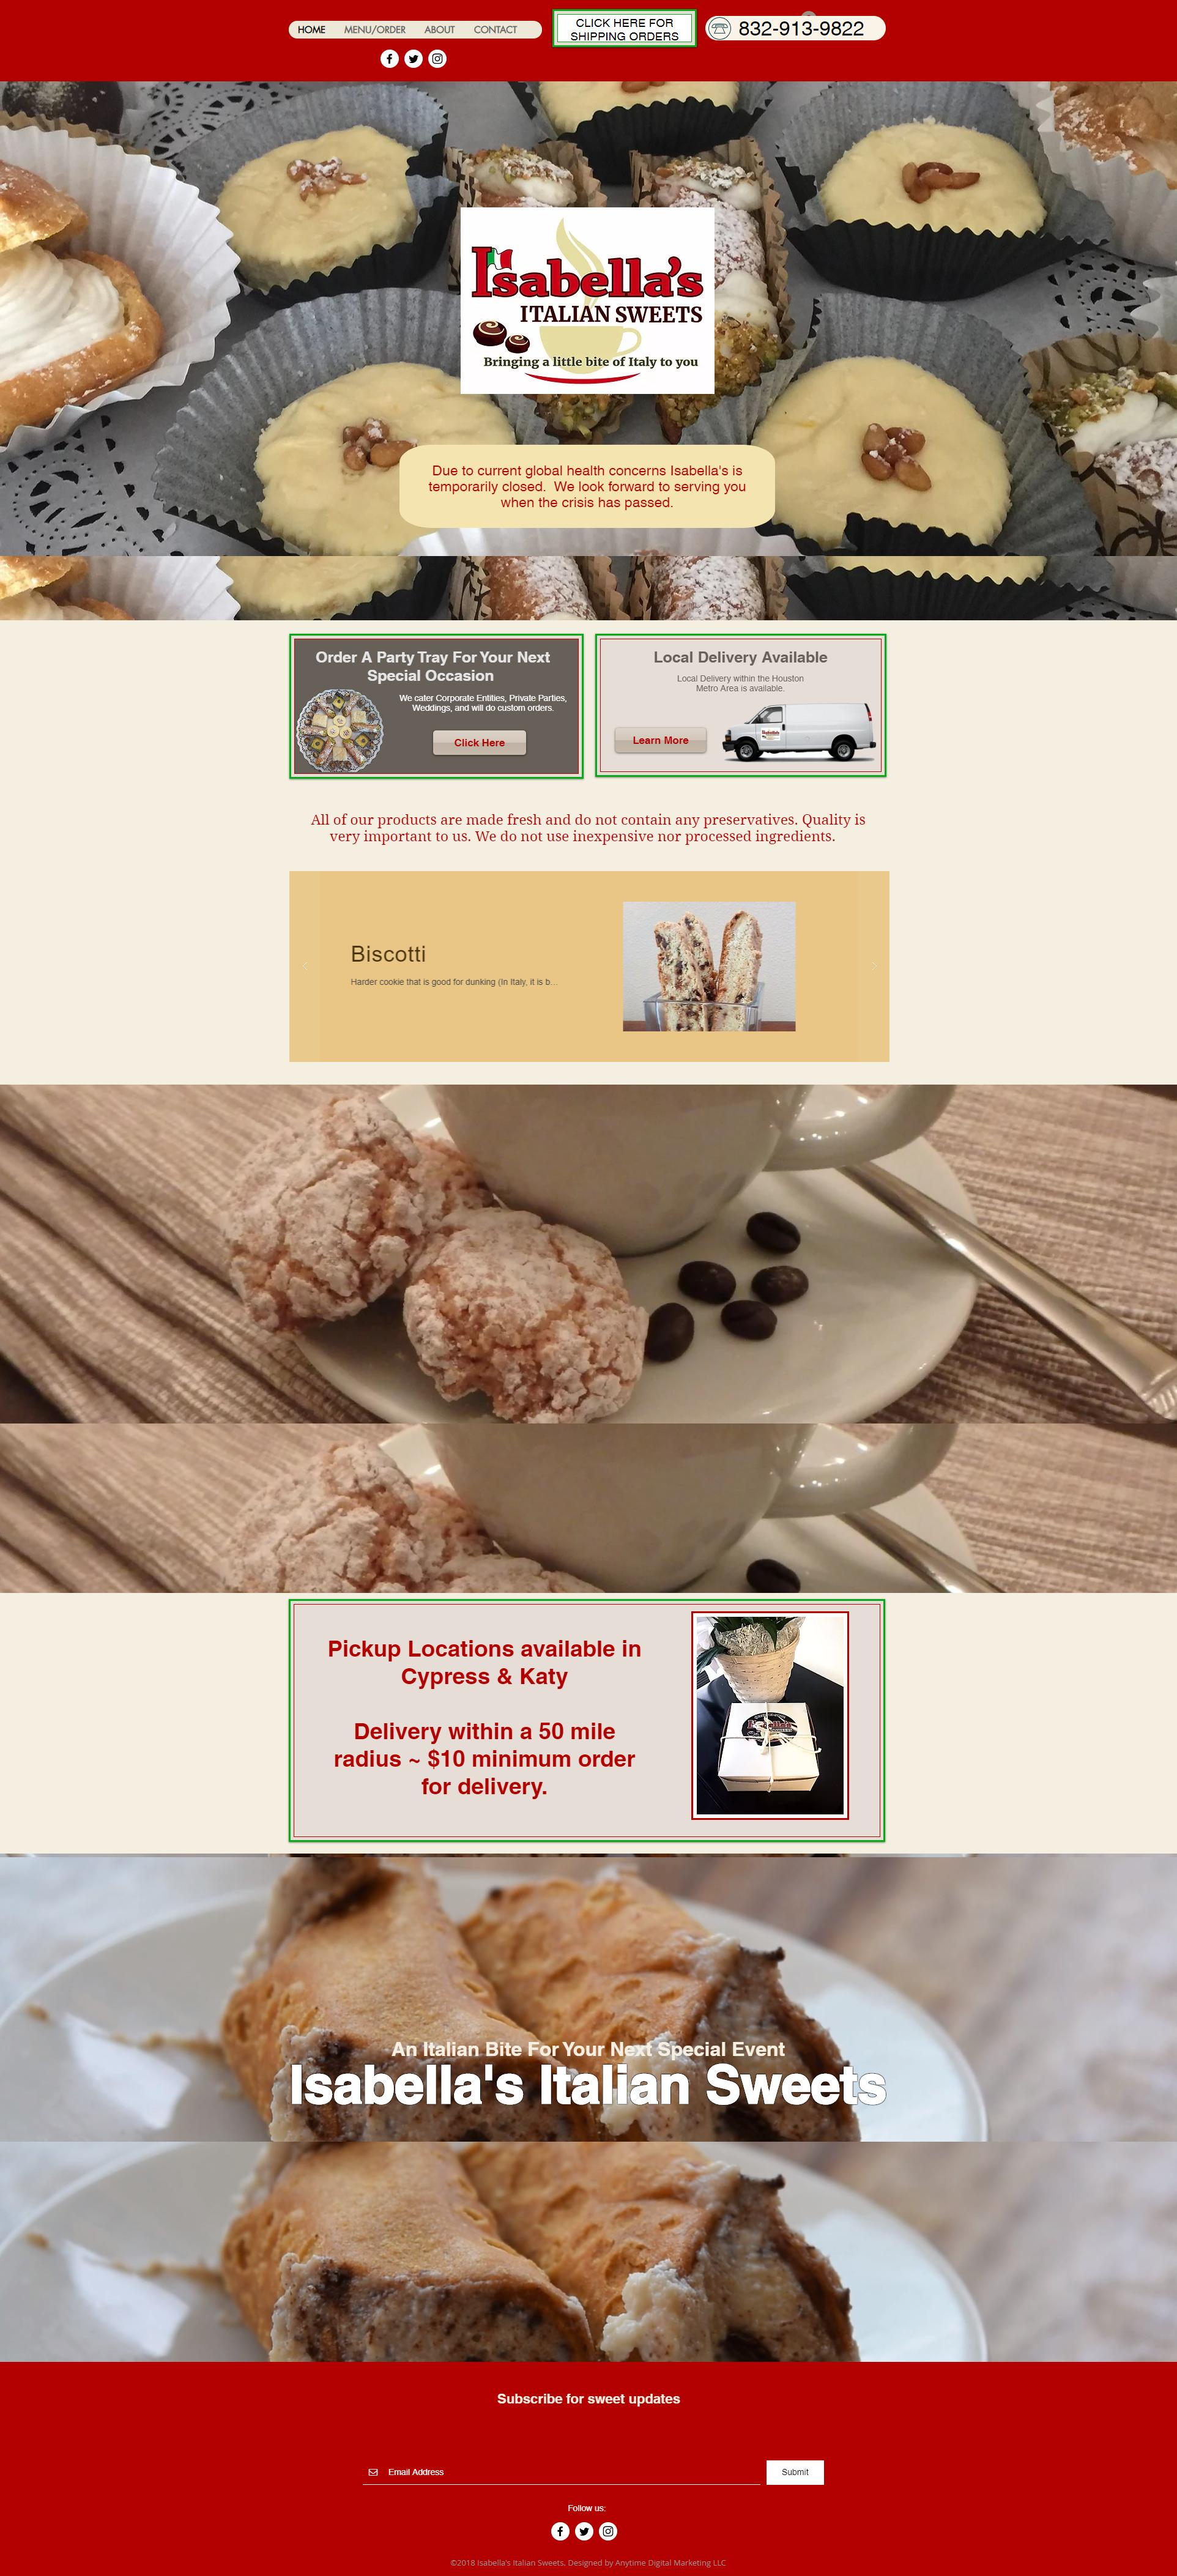 Isabellas Italian Sweets website design